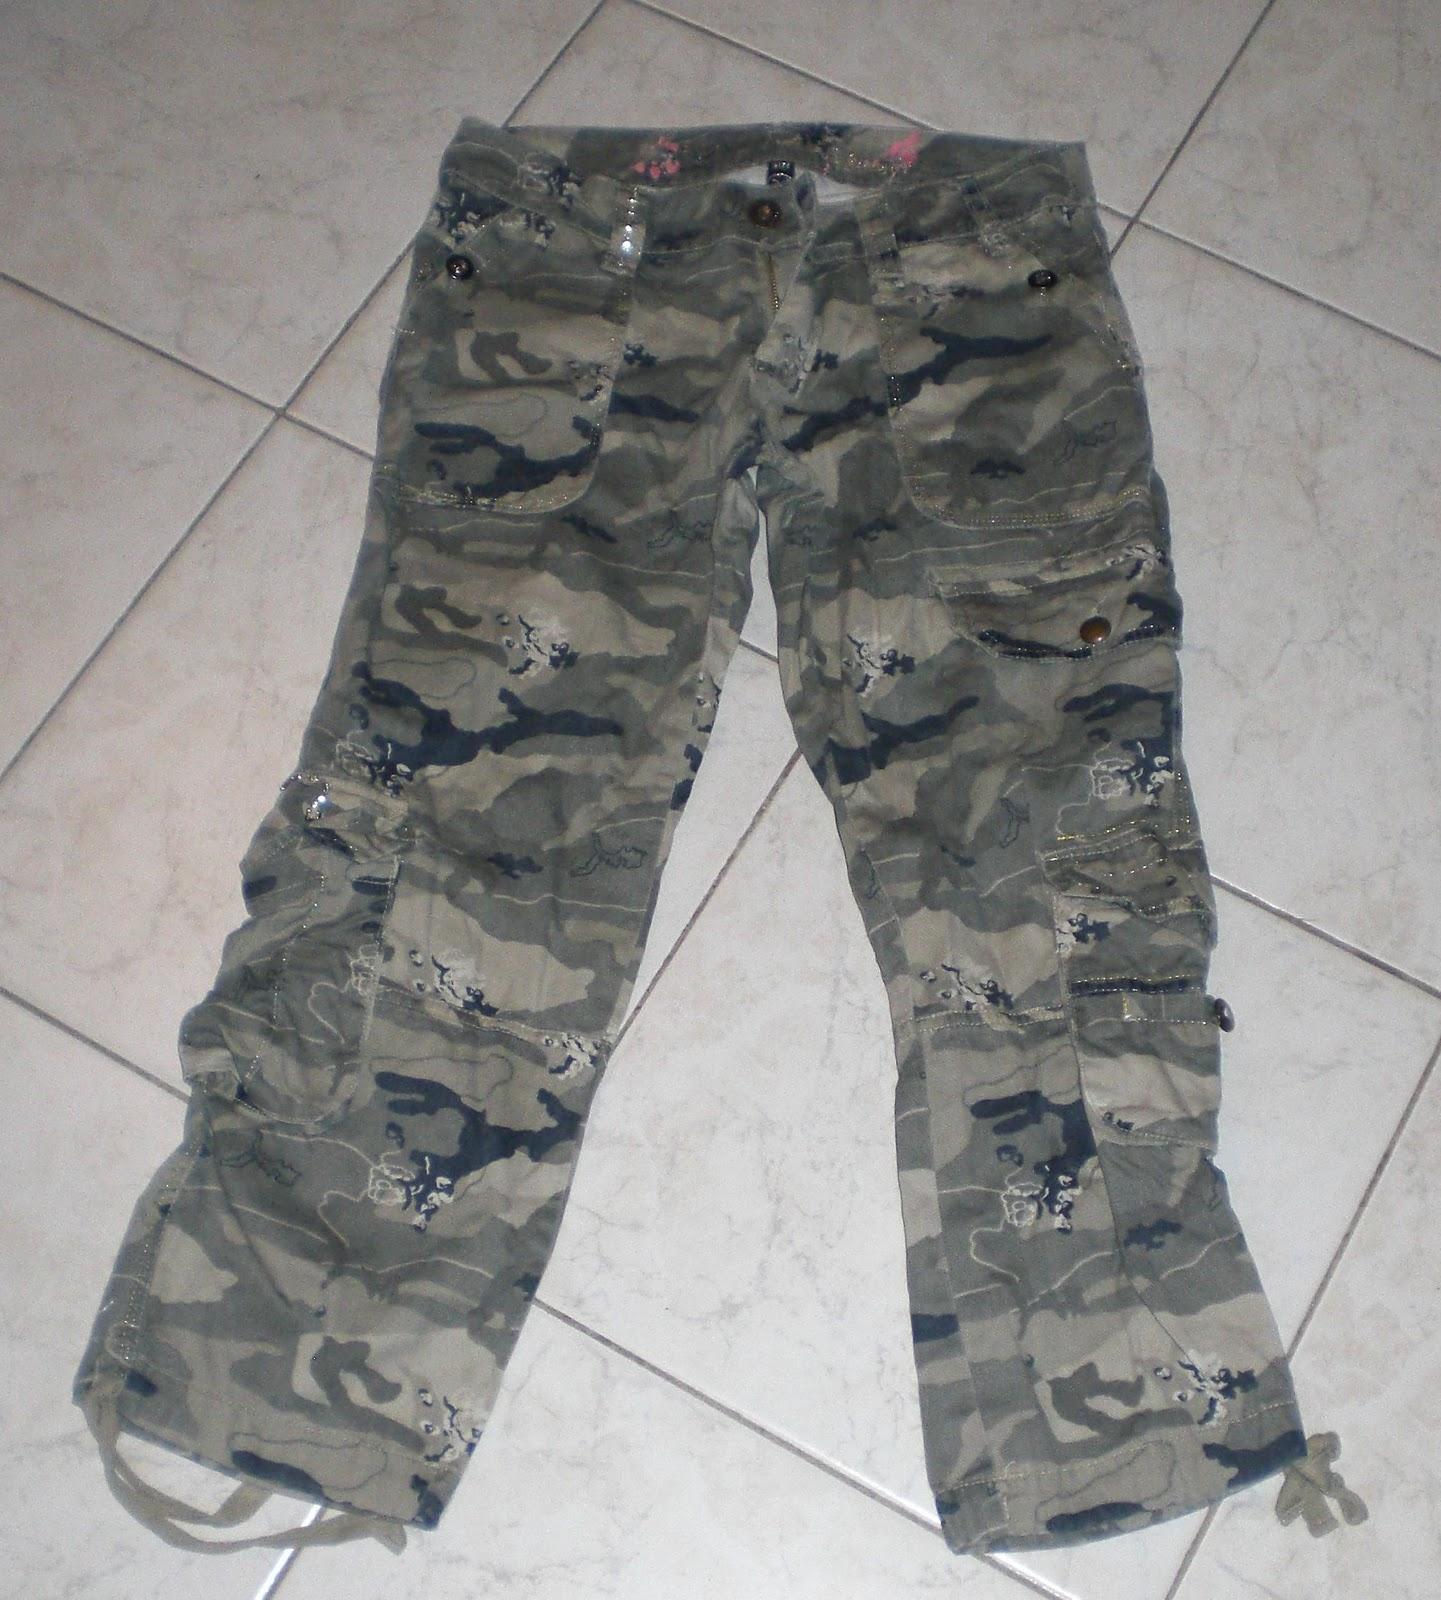 Miss coco vide son dressing montpellier h rault 34 pantalon style treillis t 38 - Vide dressing montpellier ...